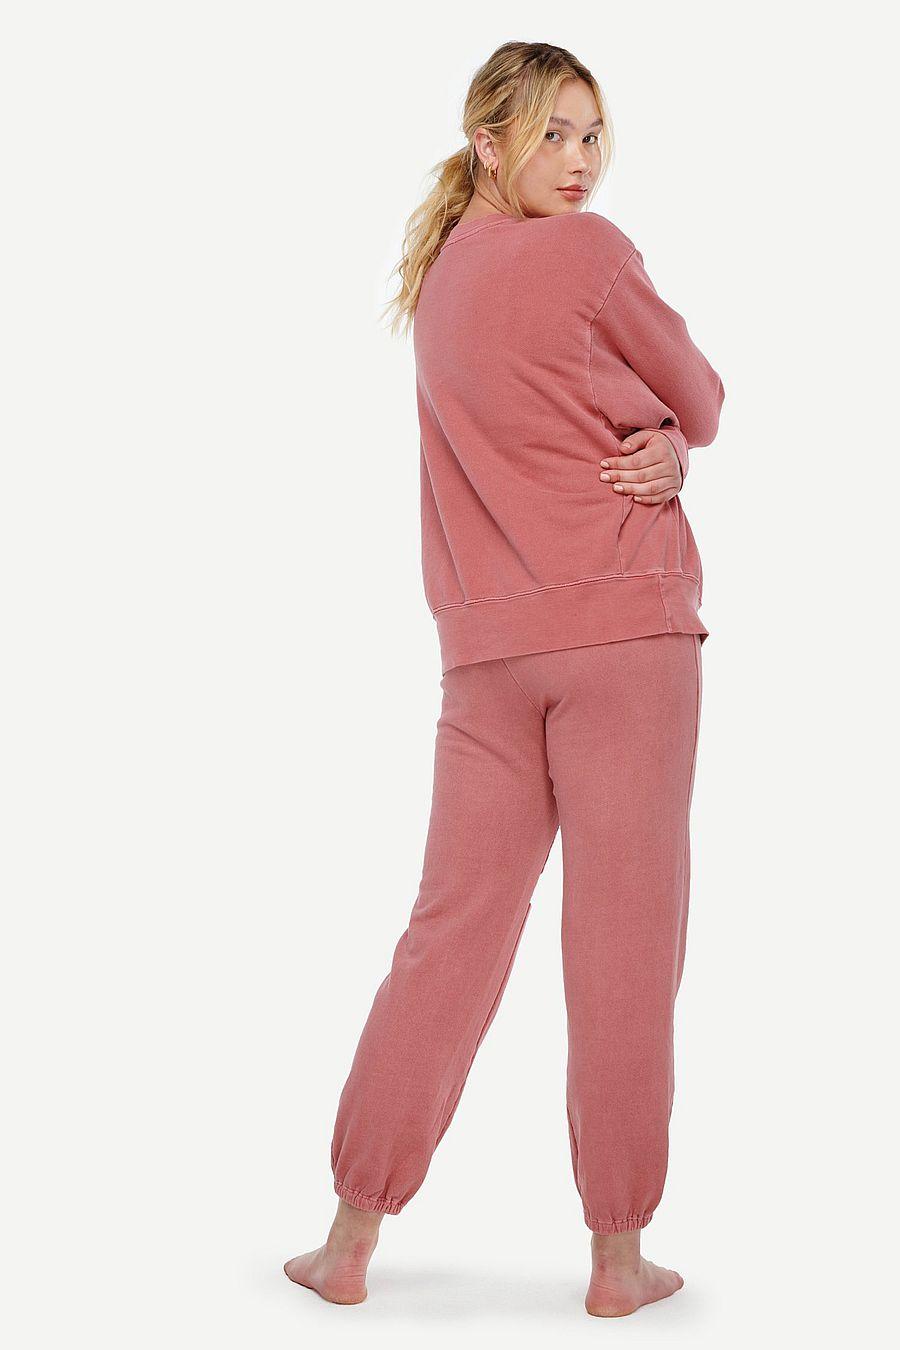 LACAUSA Clothing Slater Sweatshirt - Mesa